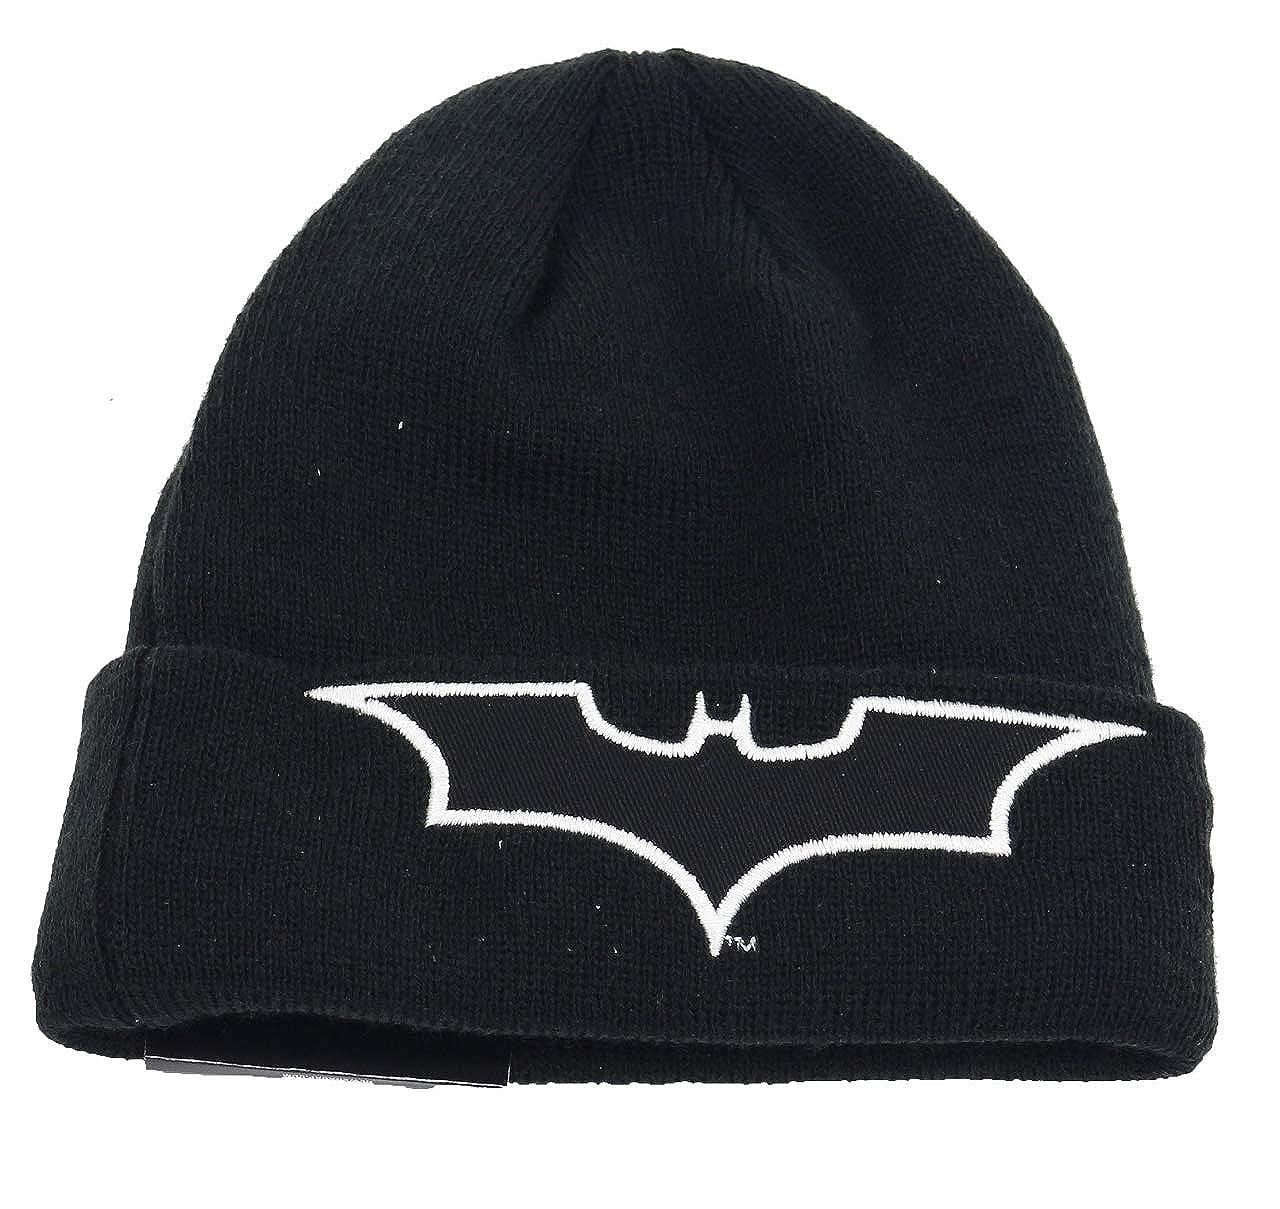 e6305bb6c8b Amazon.com  New Era Glow in The Dark Knit Batman Child Beanie Beany Wool Hat  Kind Black  Clothing